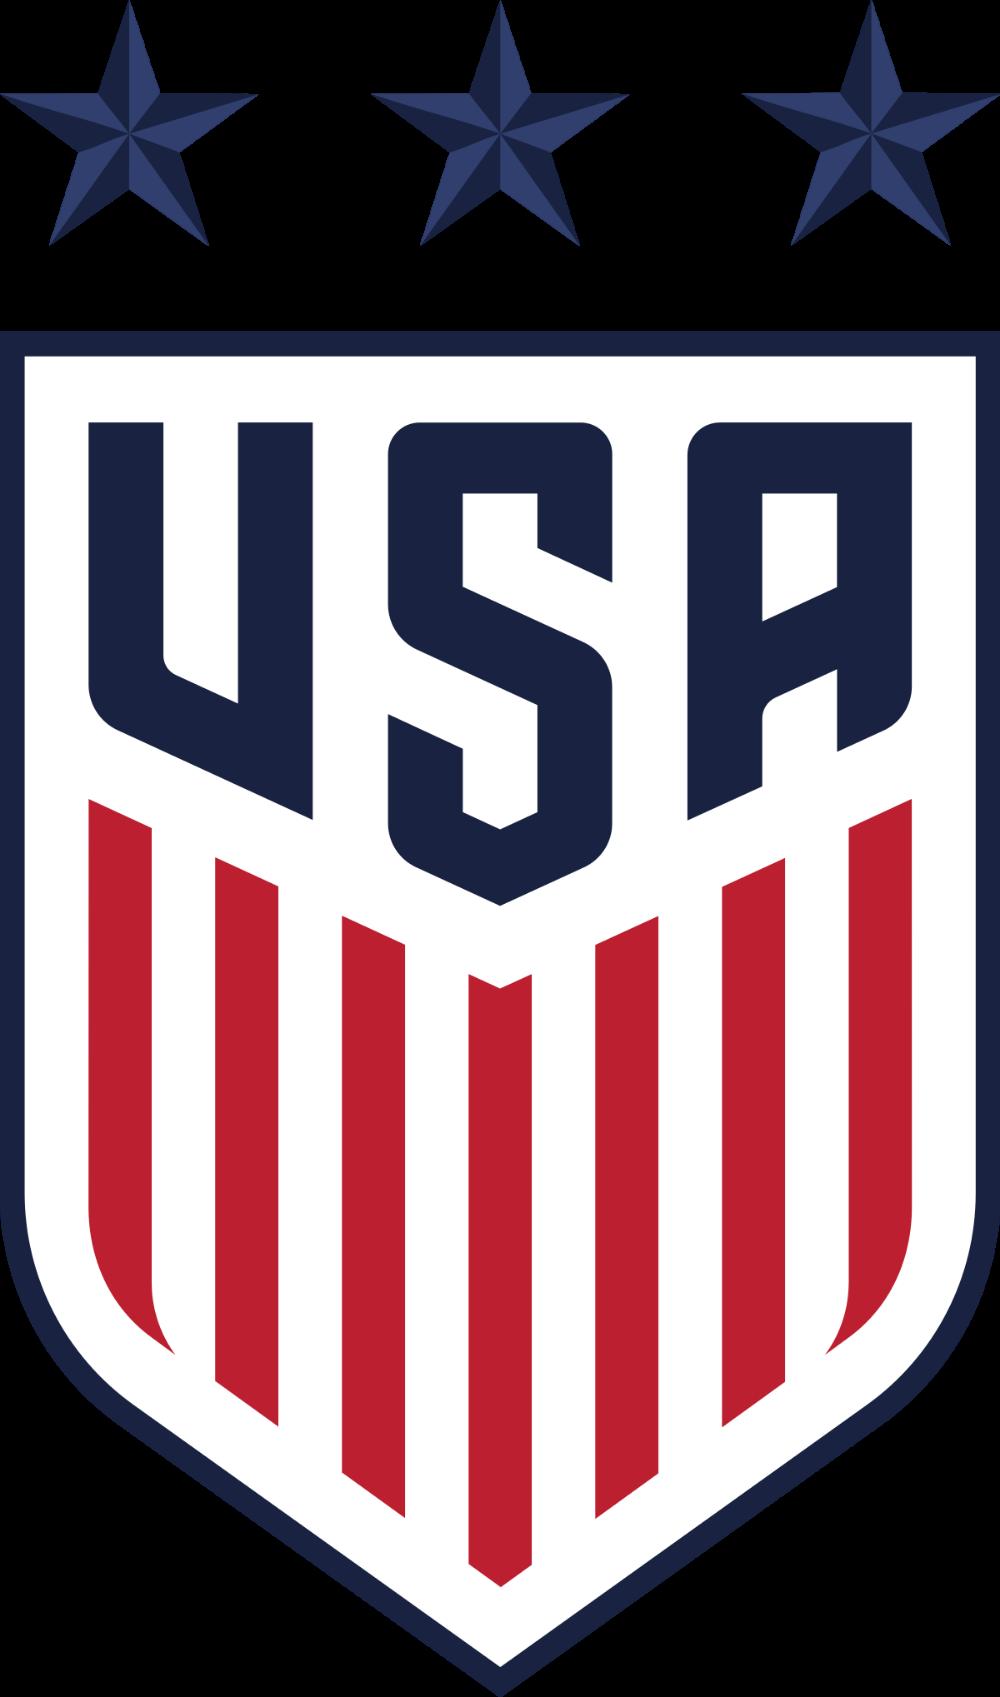 USWNT svg Google Search Usa soccer team, Uswnt soccer